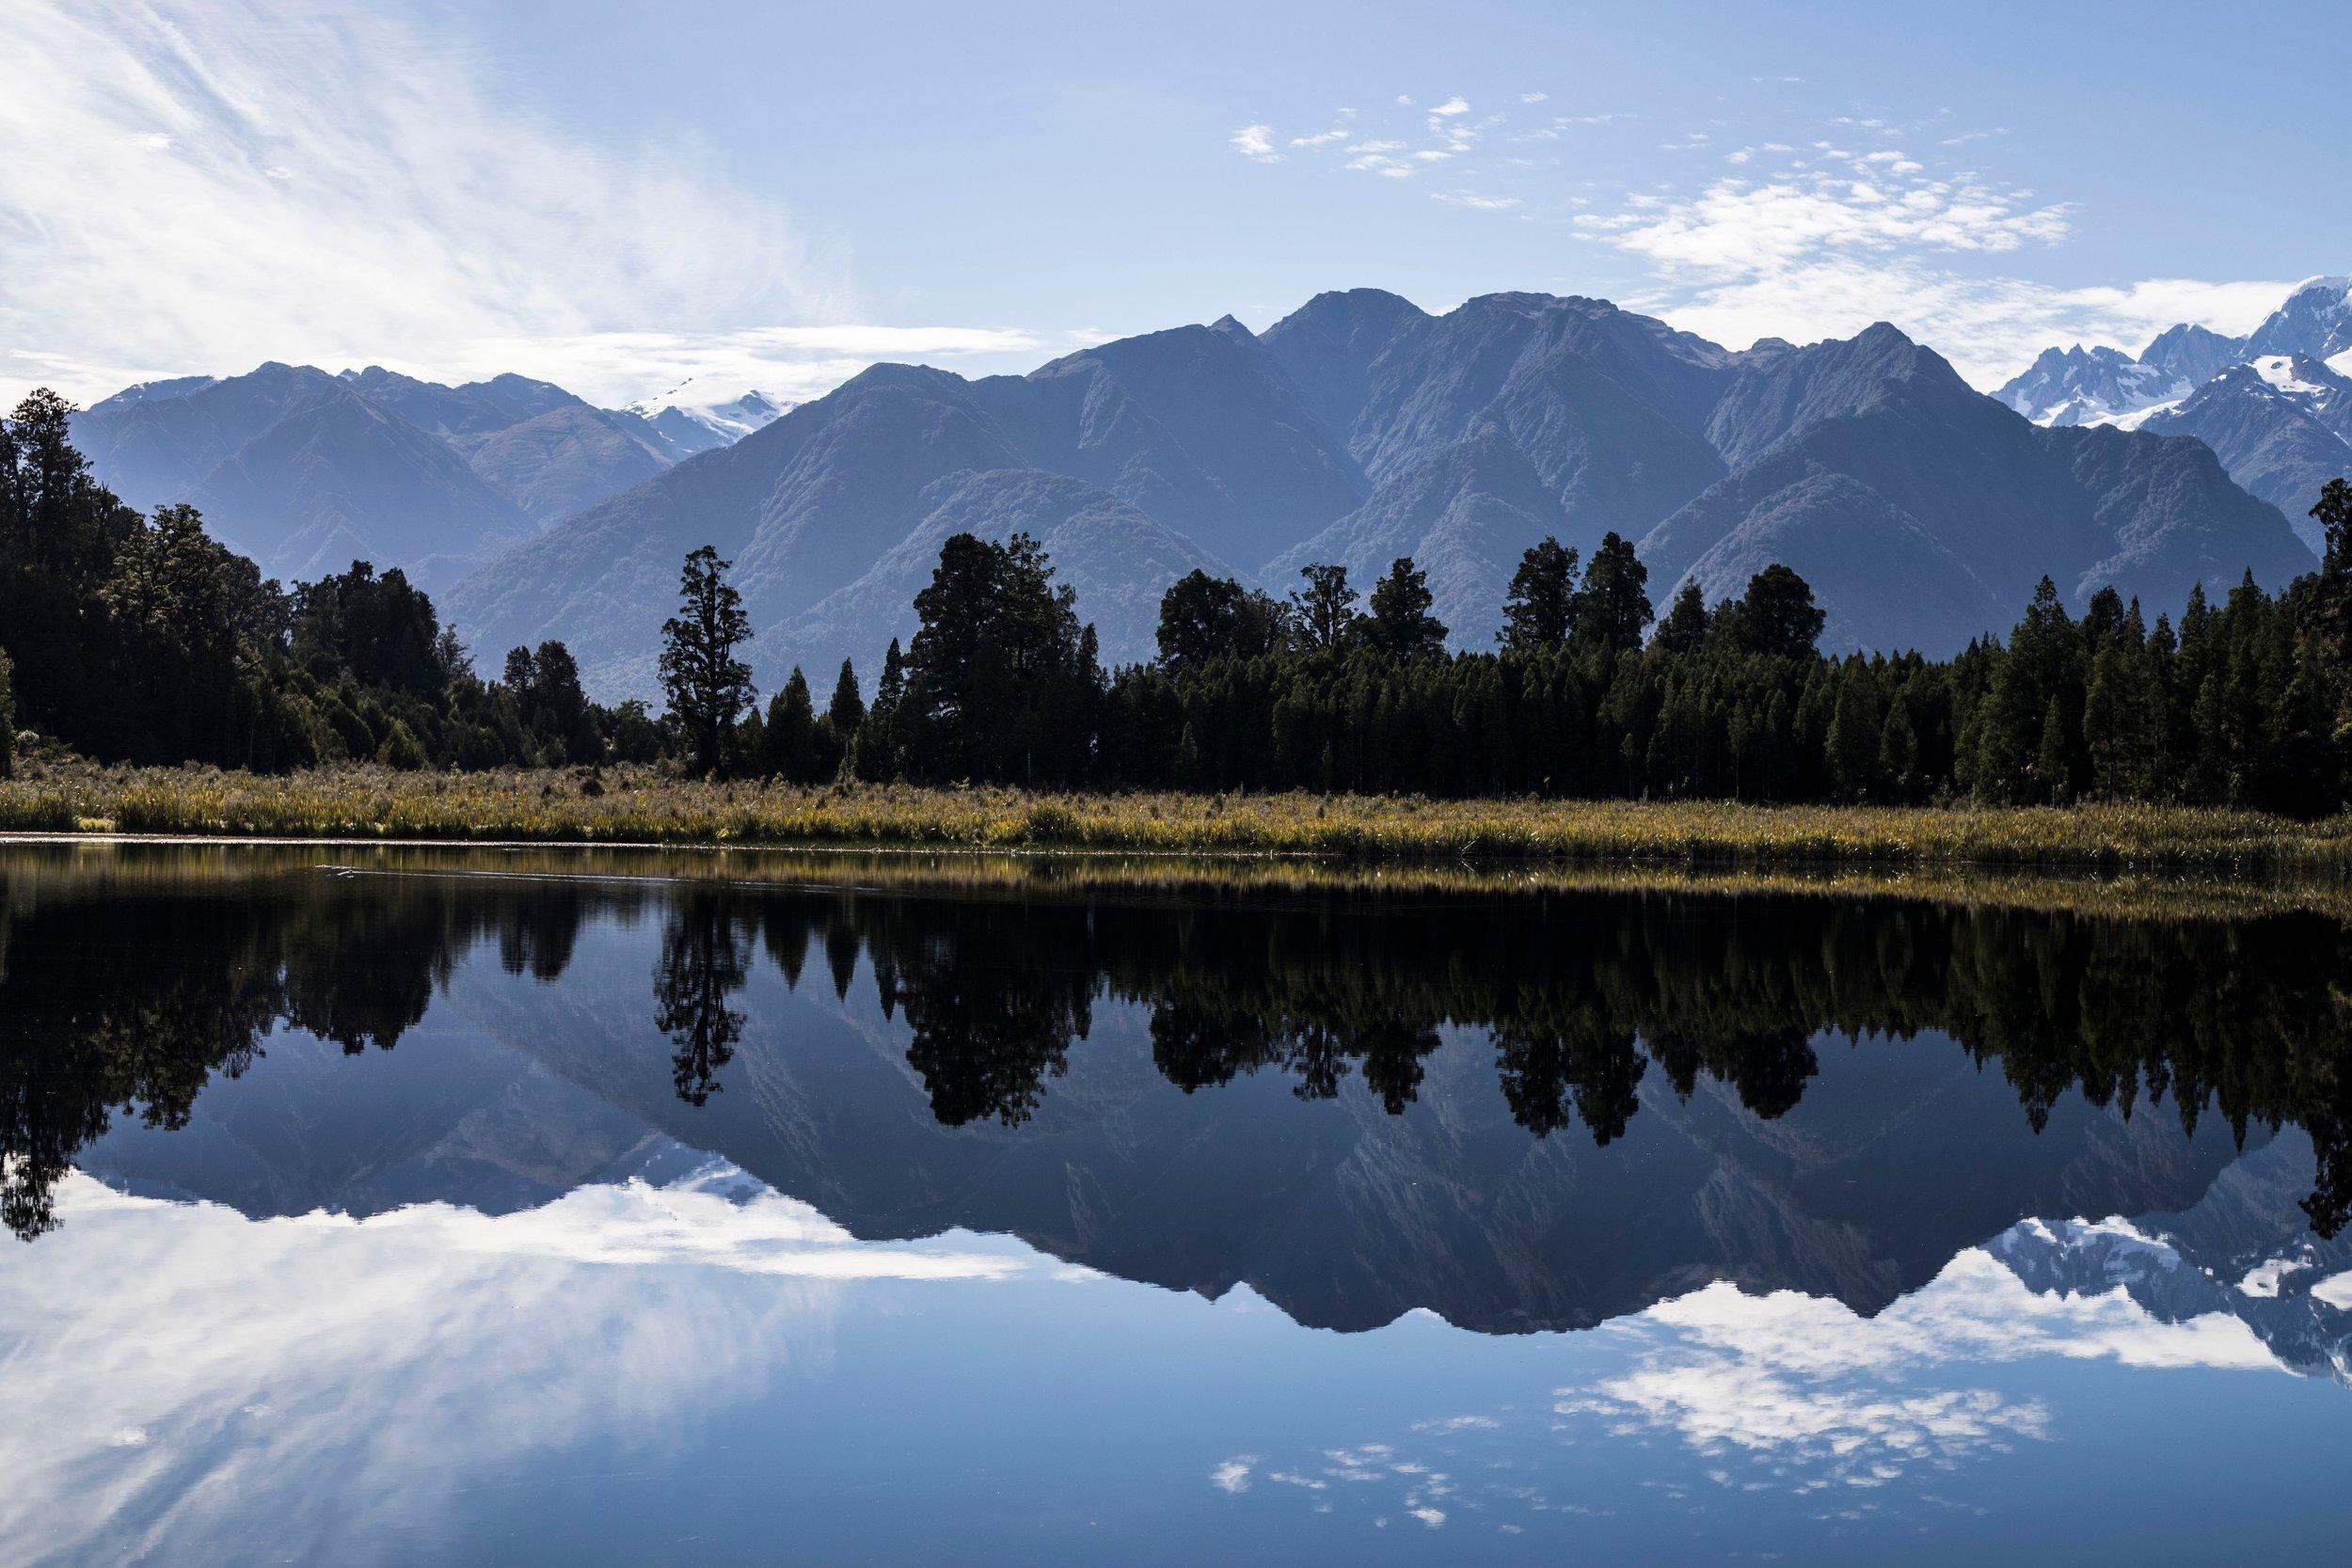 Reflection at Lake Matheson, New Zealand